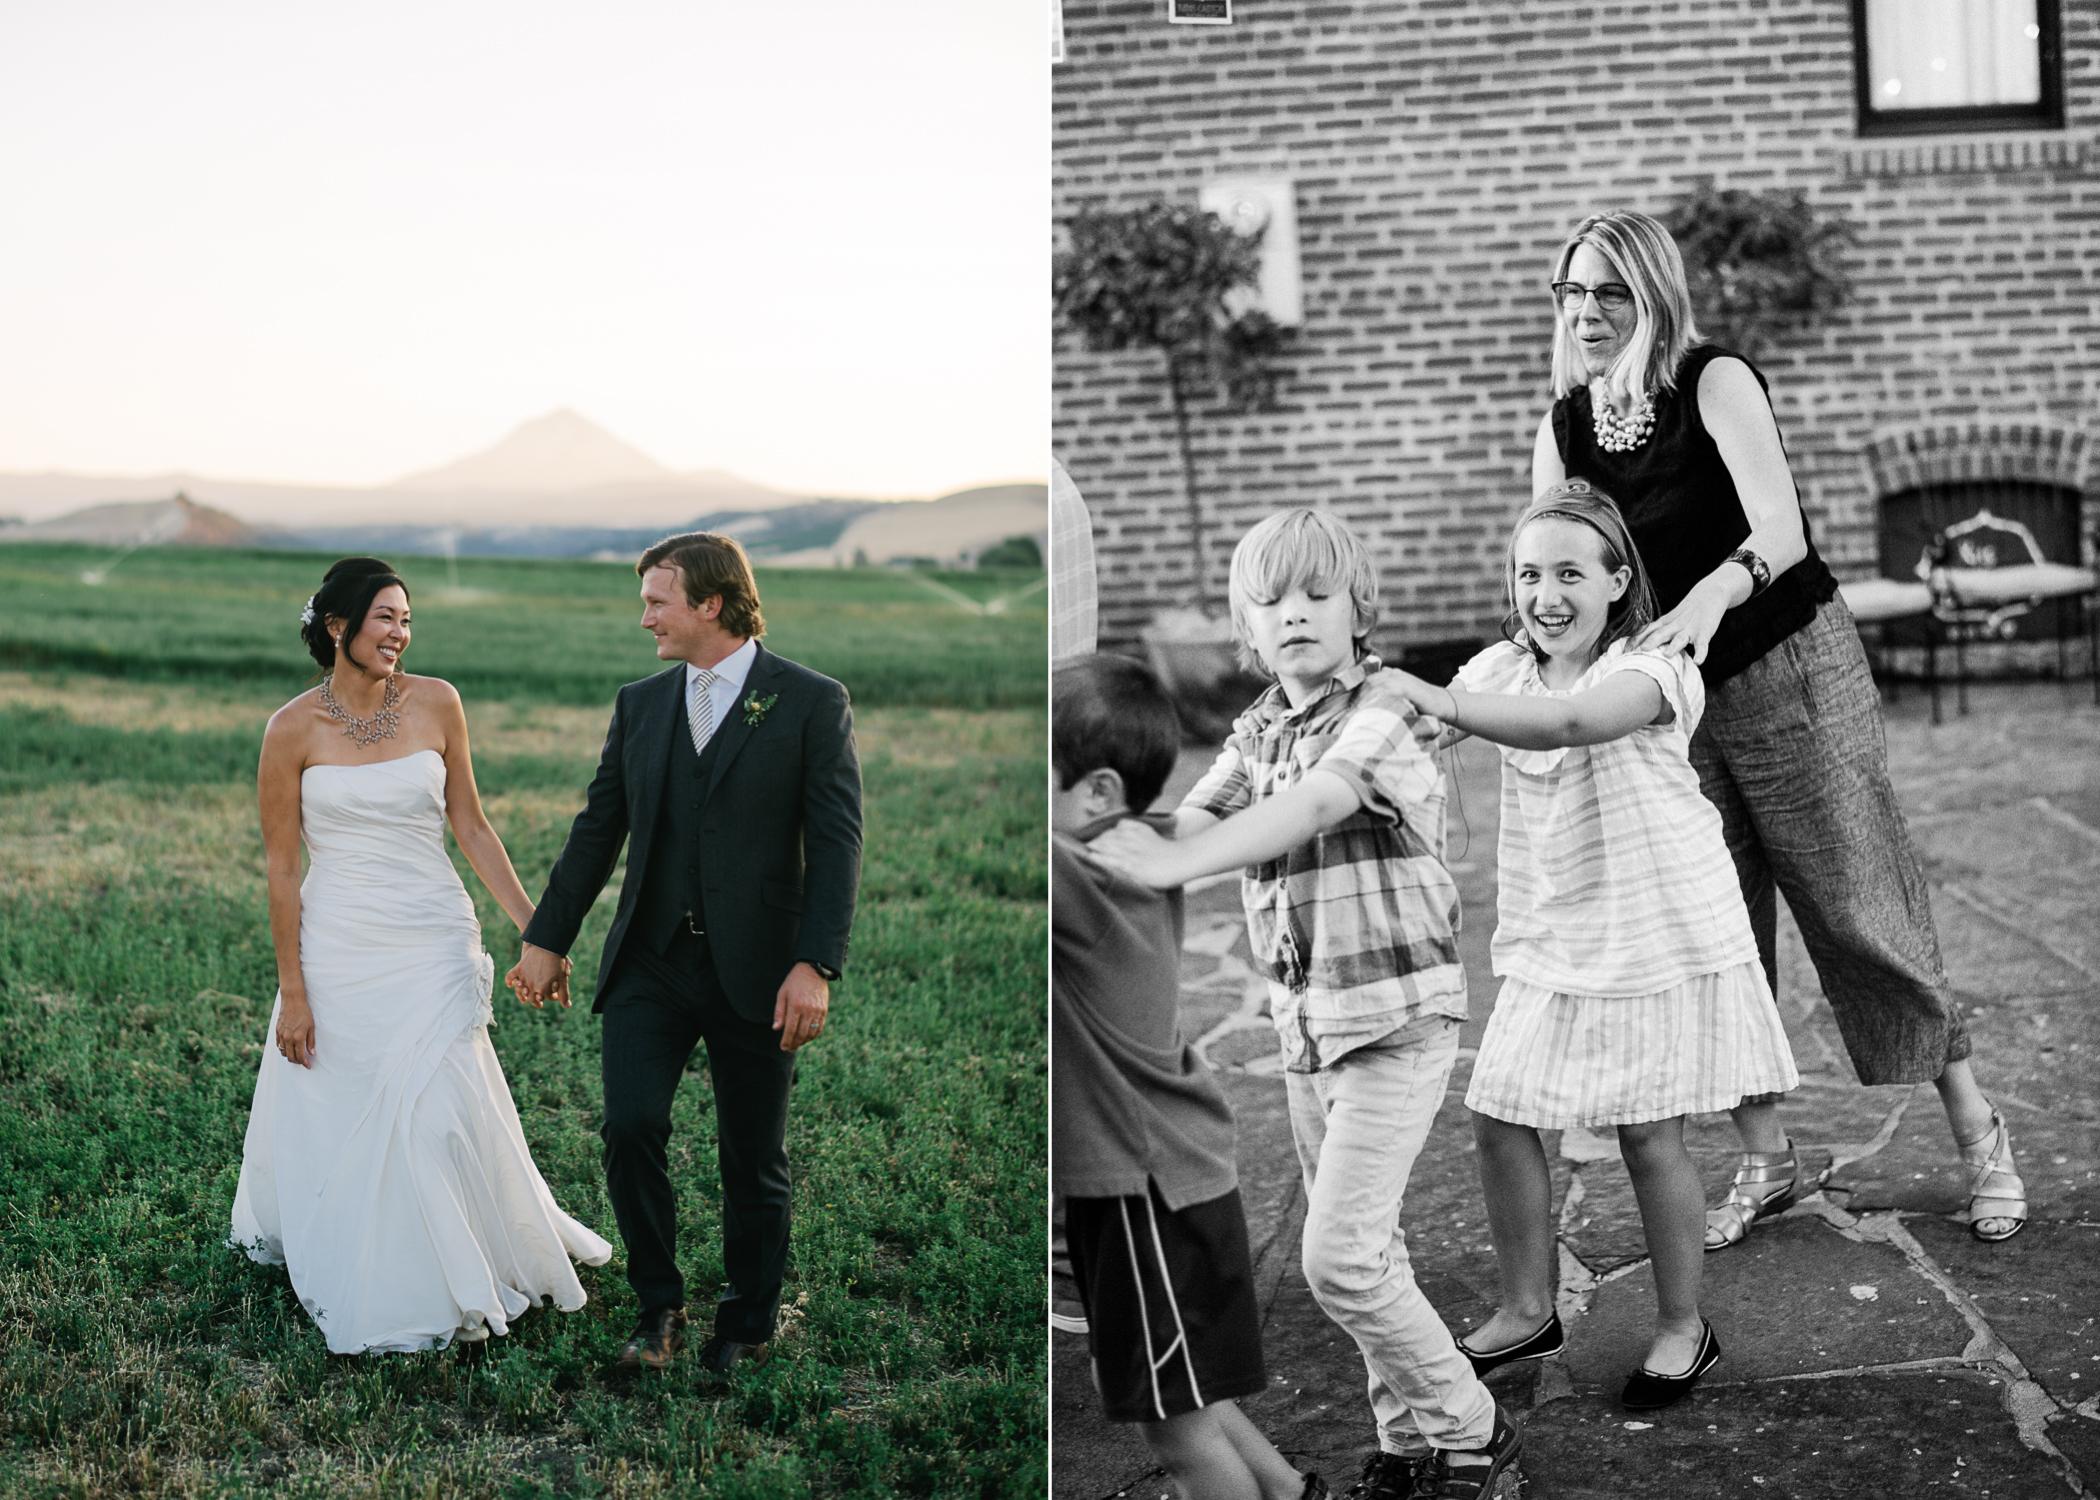 020-portland-wedding-photography-best-2018.jpg